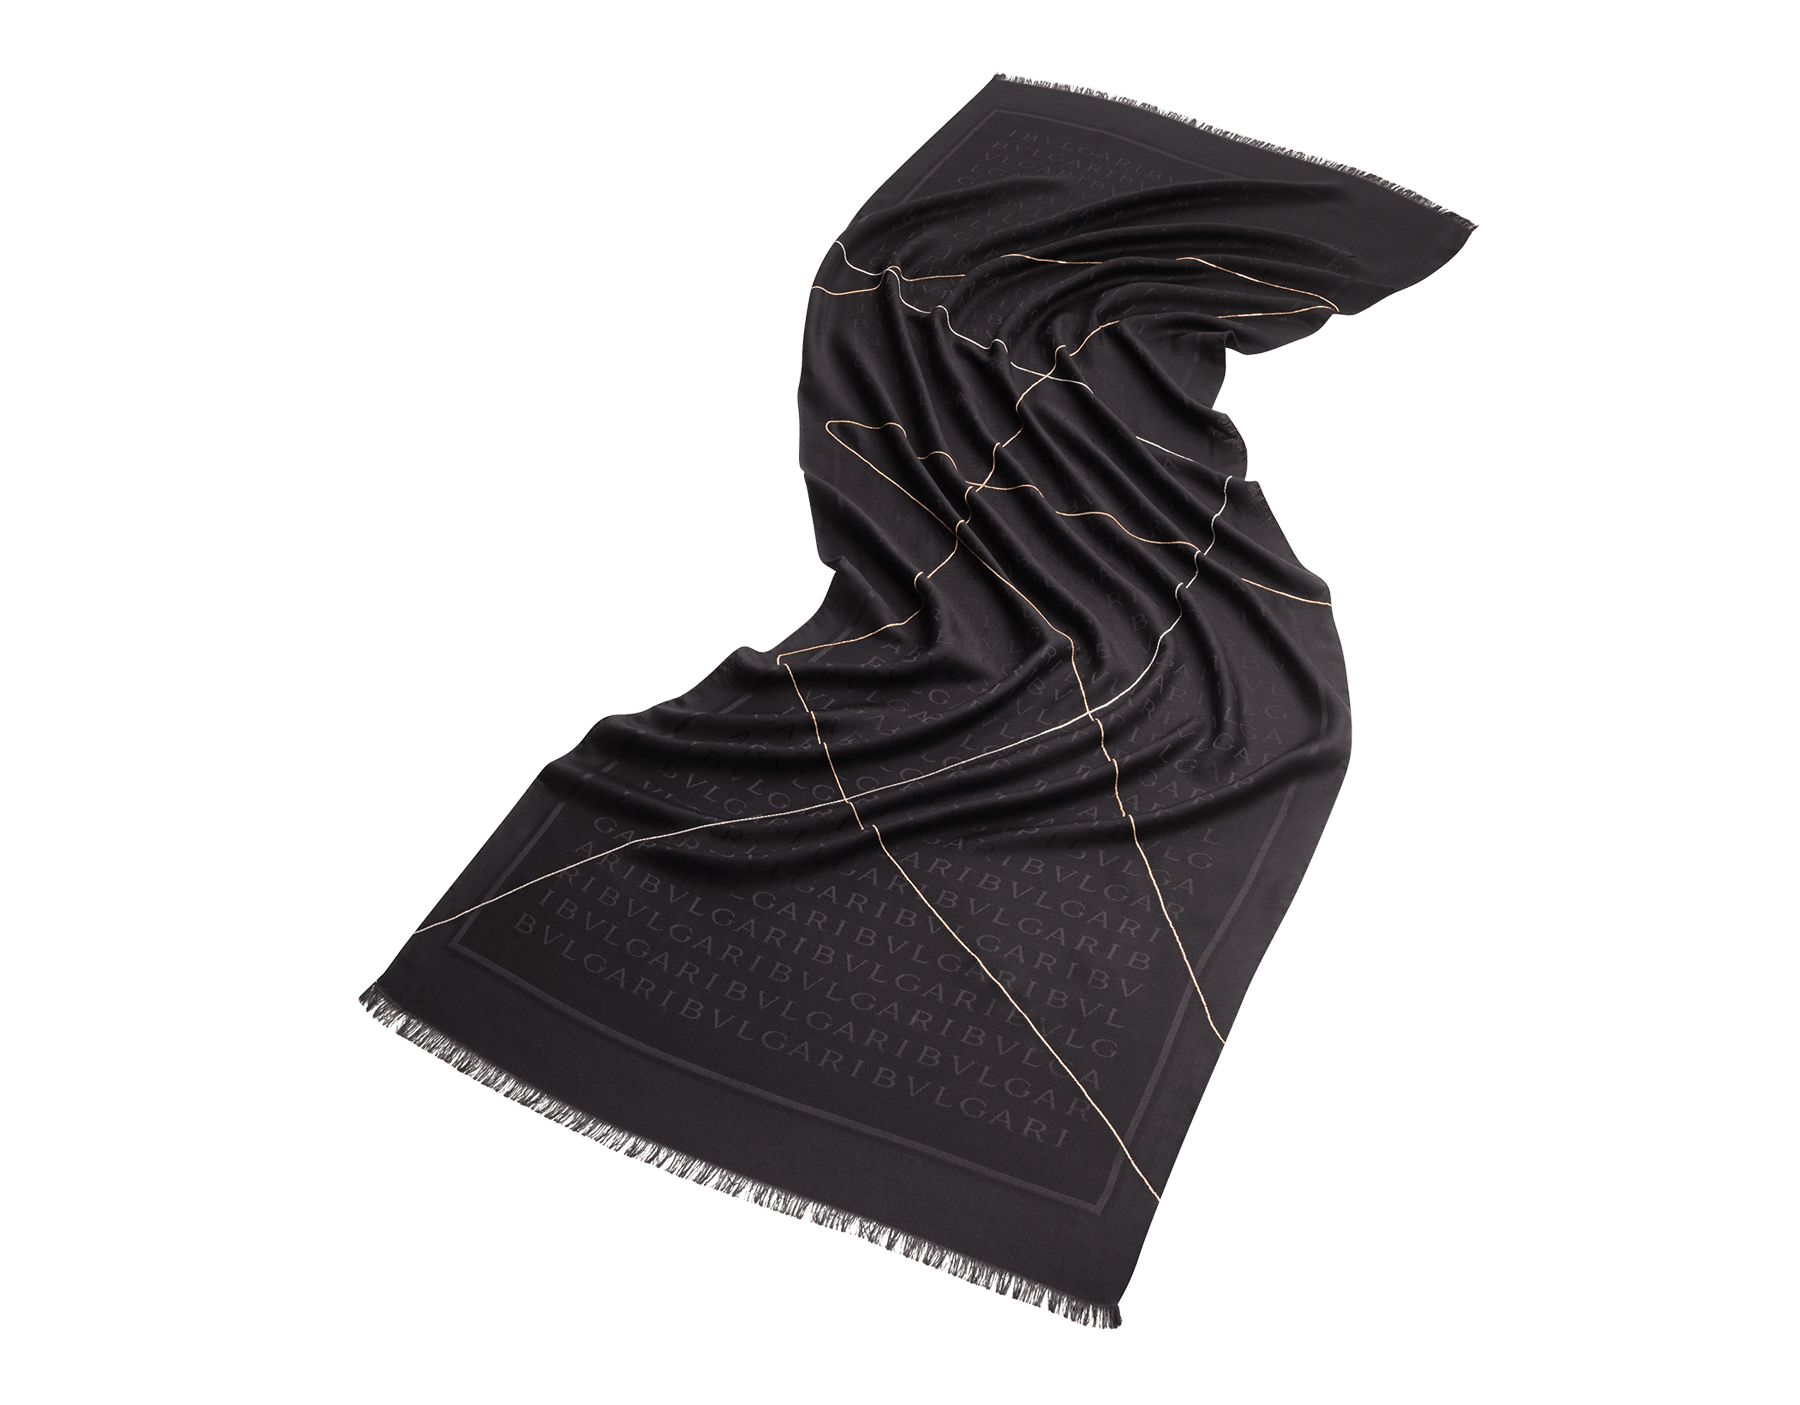 Палантин Lettere Chain черного цвета, тонкий шелк и шерсть. 243964 image 1